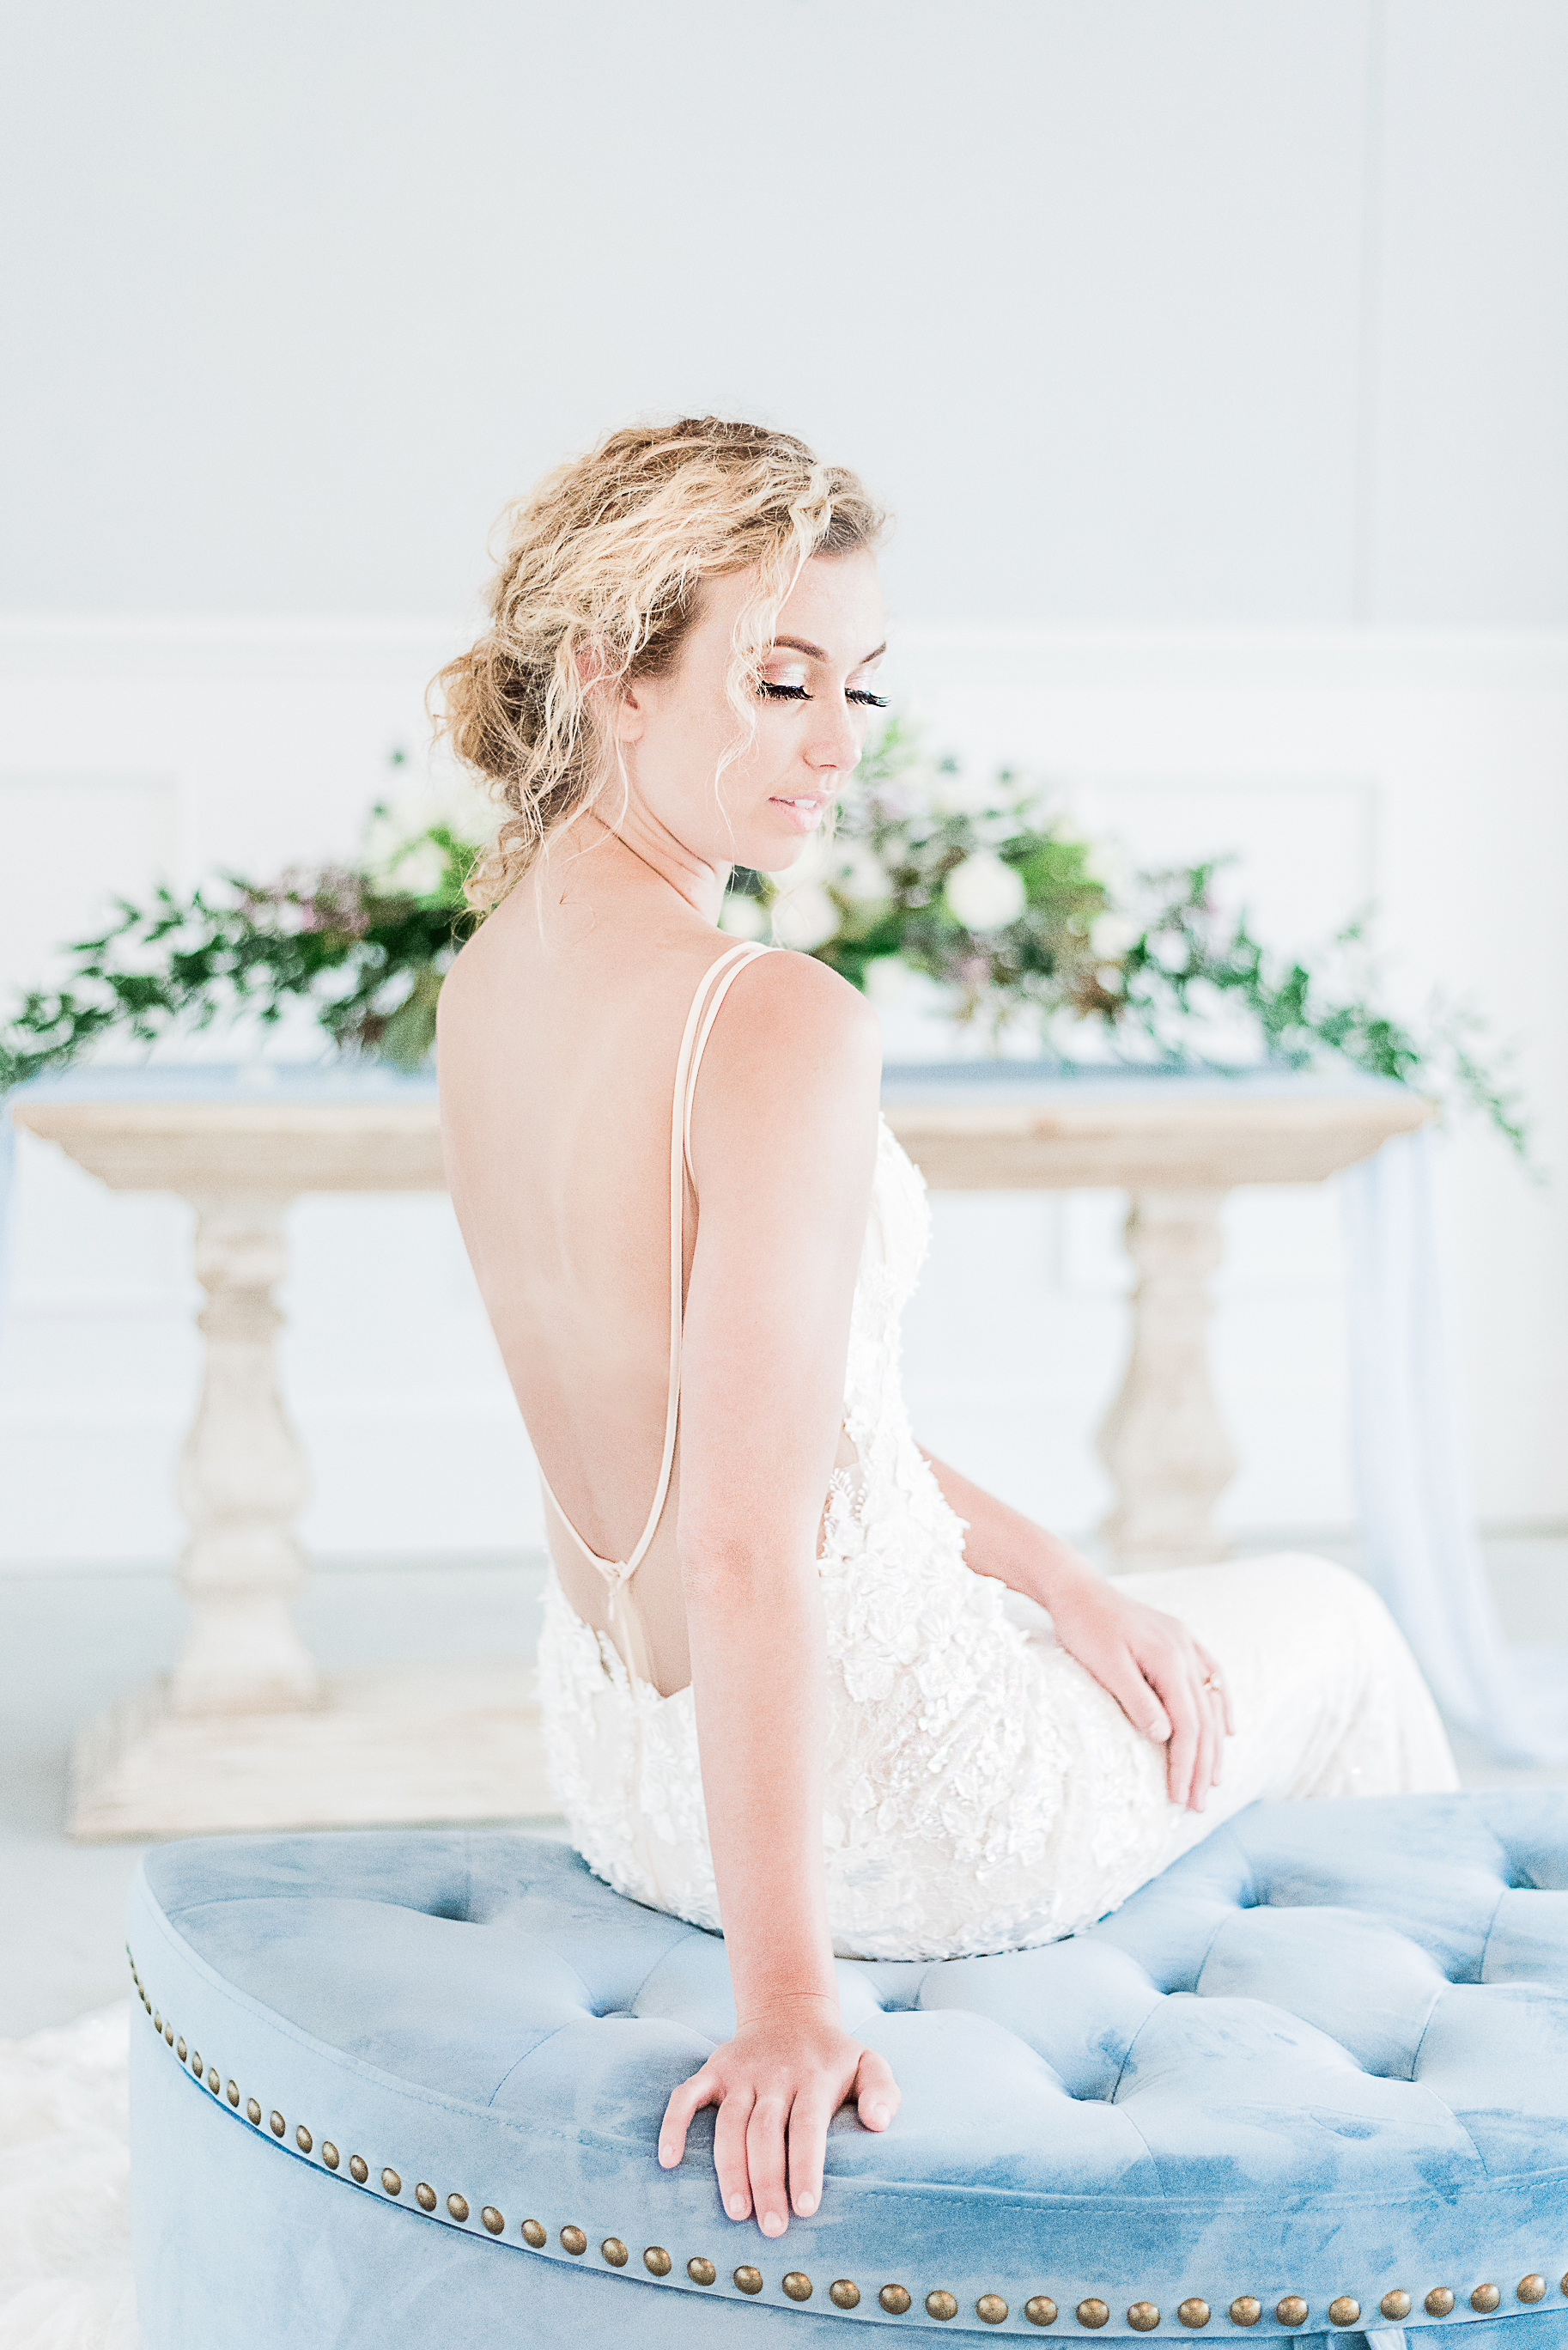 blue themed wedding indoor photography illusion back wedding dress